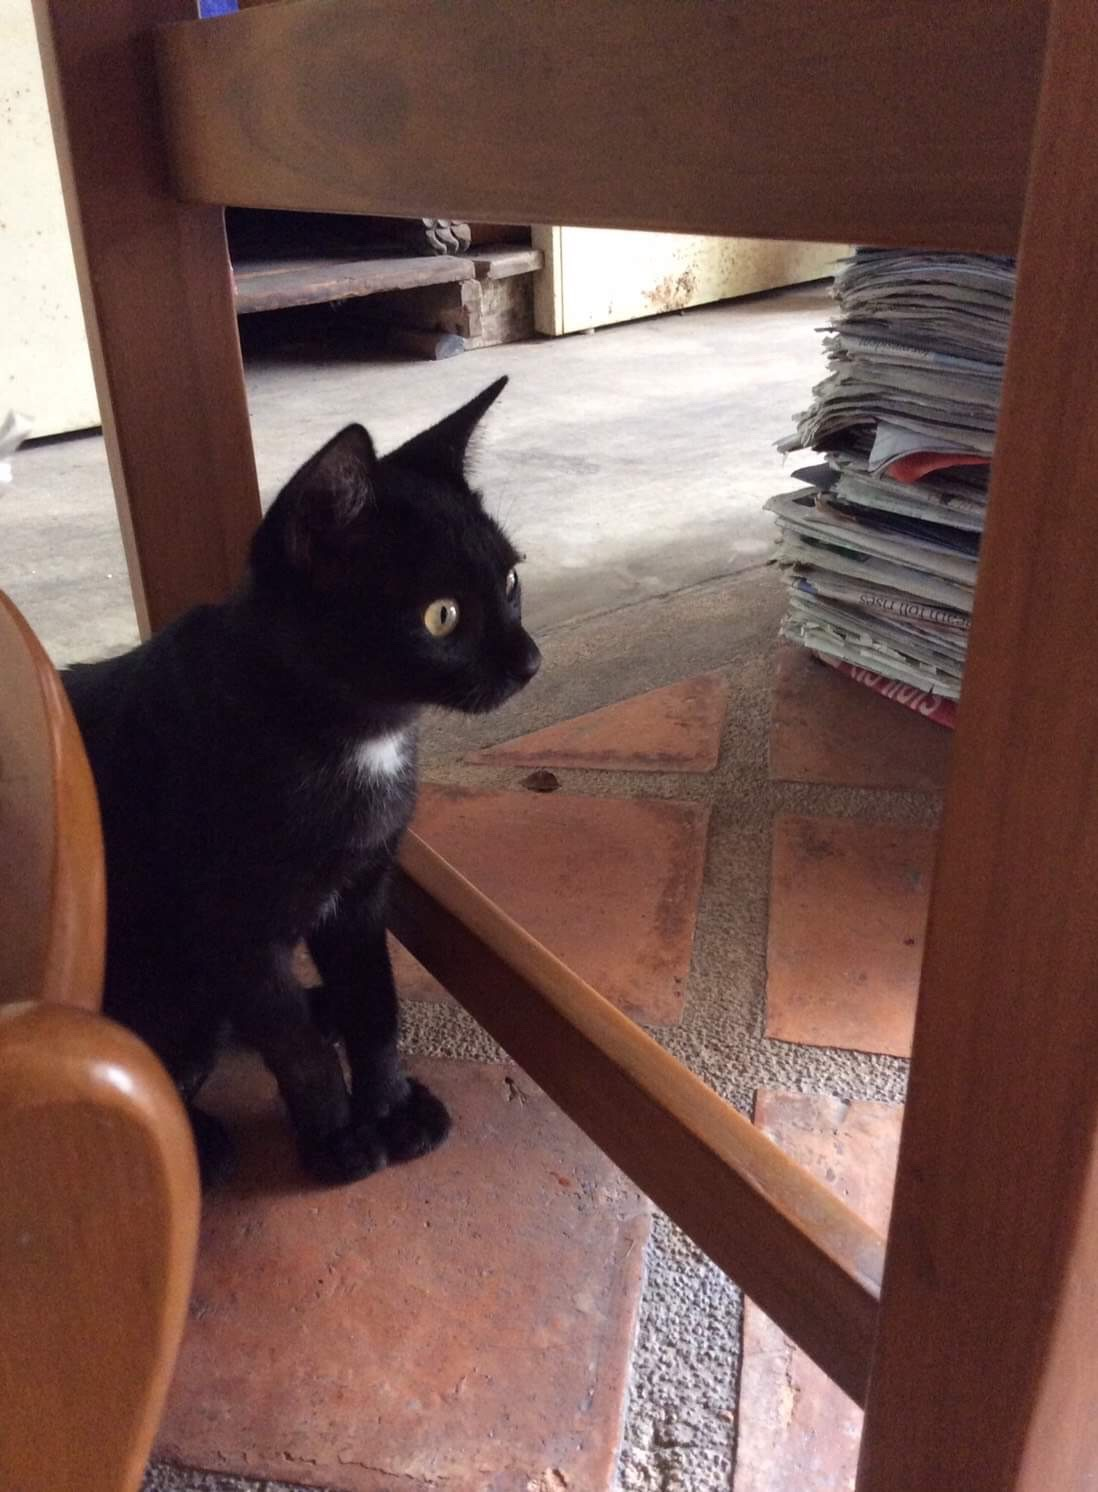 SATAN'S BLACK CAT , LONELY UNDER TABLE 🐱🐈😈😿 ( แมวดำซาตานเหงาอยู่ใต้โต๊ะ 🐱🐈😈😿 )